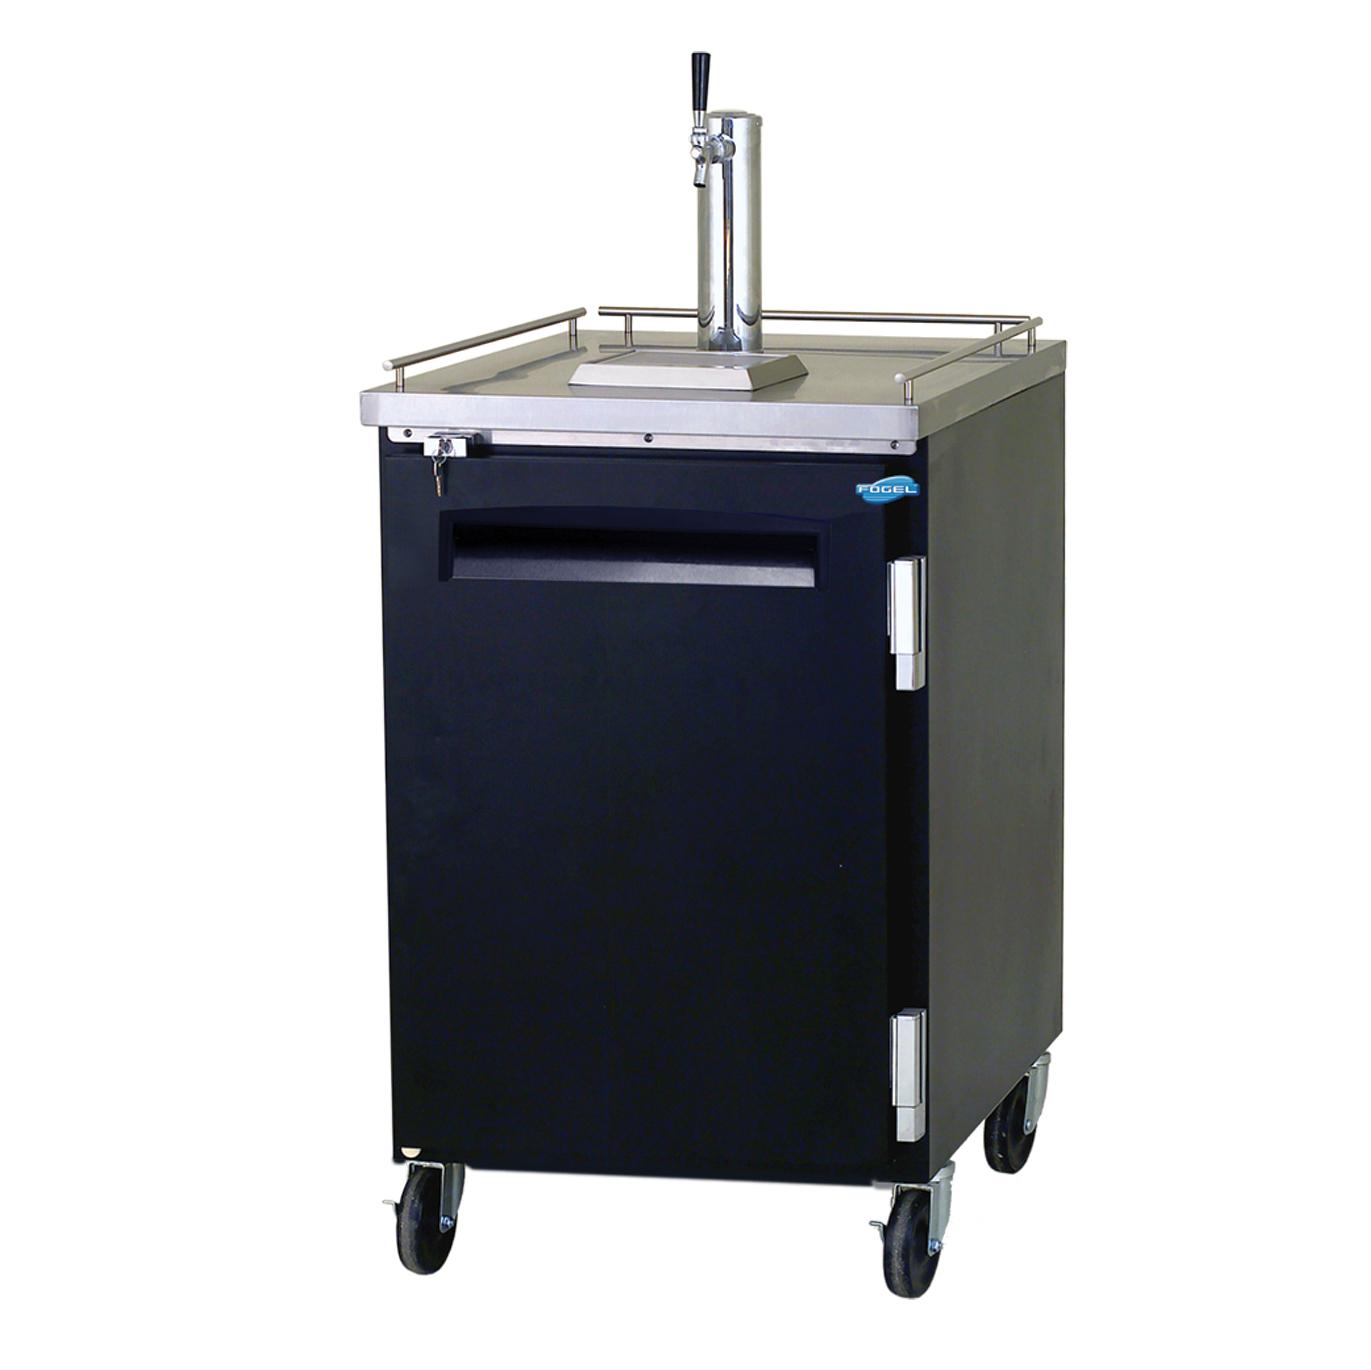 Fogel USA DBD-1E-2 draft beer cooler